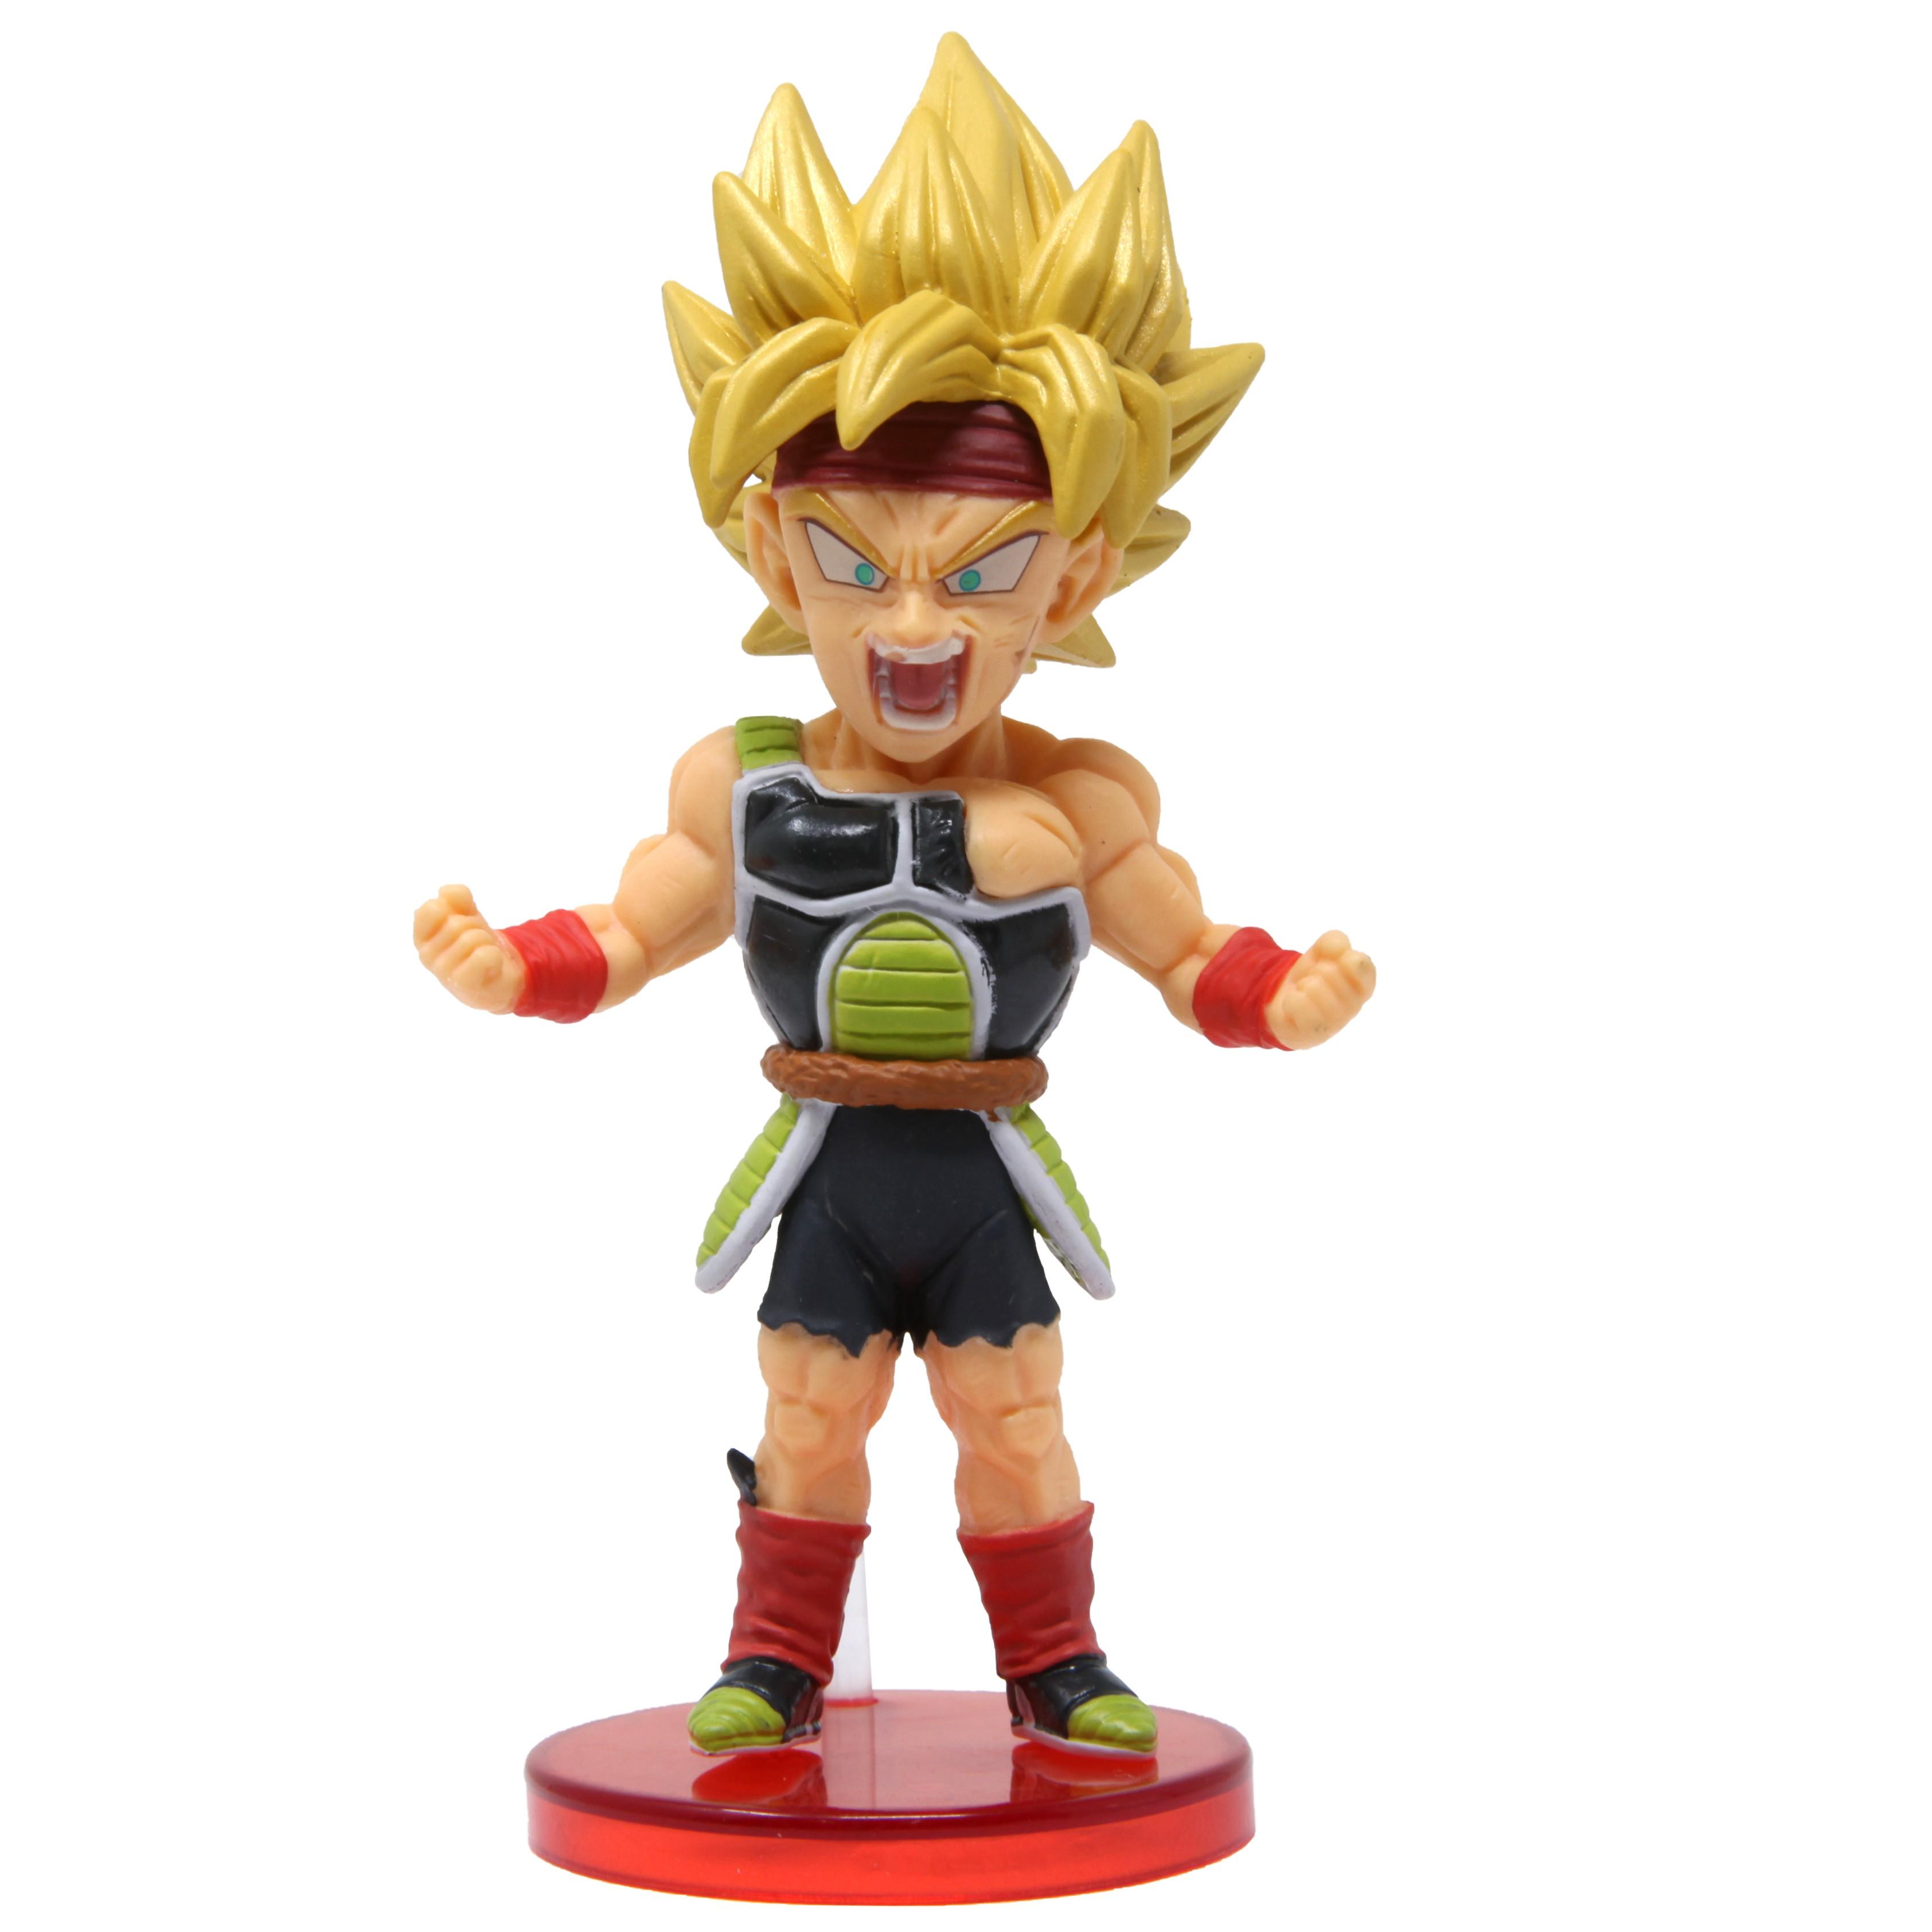 Banpresto Dragon Ball Legends Collab World Collectable Figure Vol 1 - 06 Super Saiyan Bardock (green)